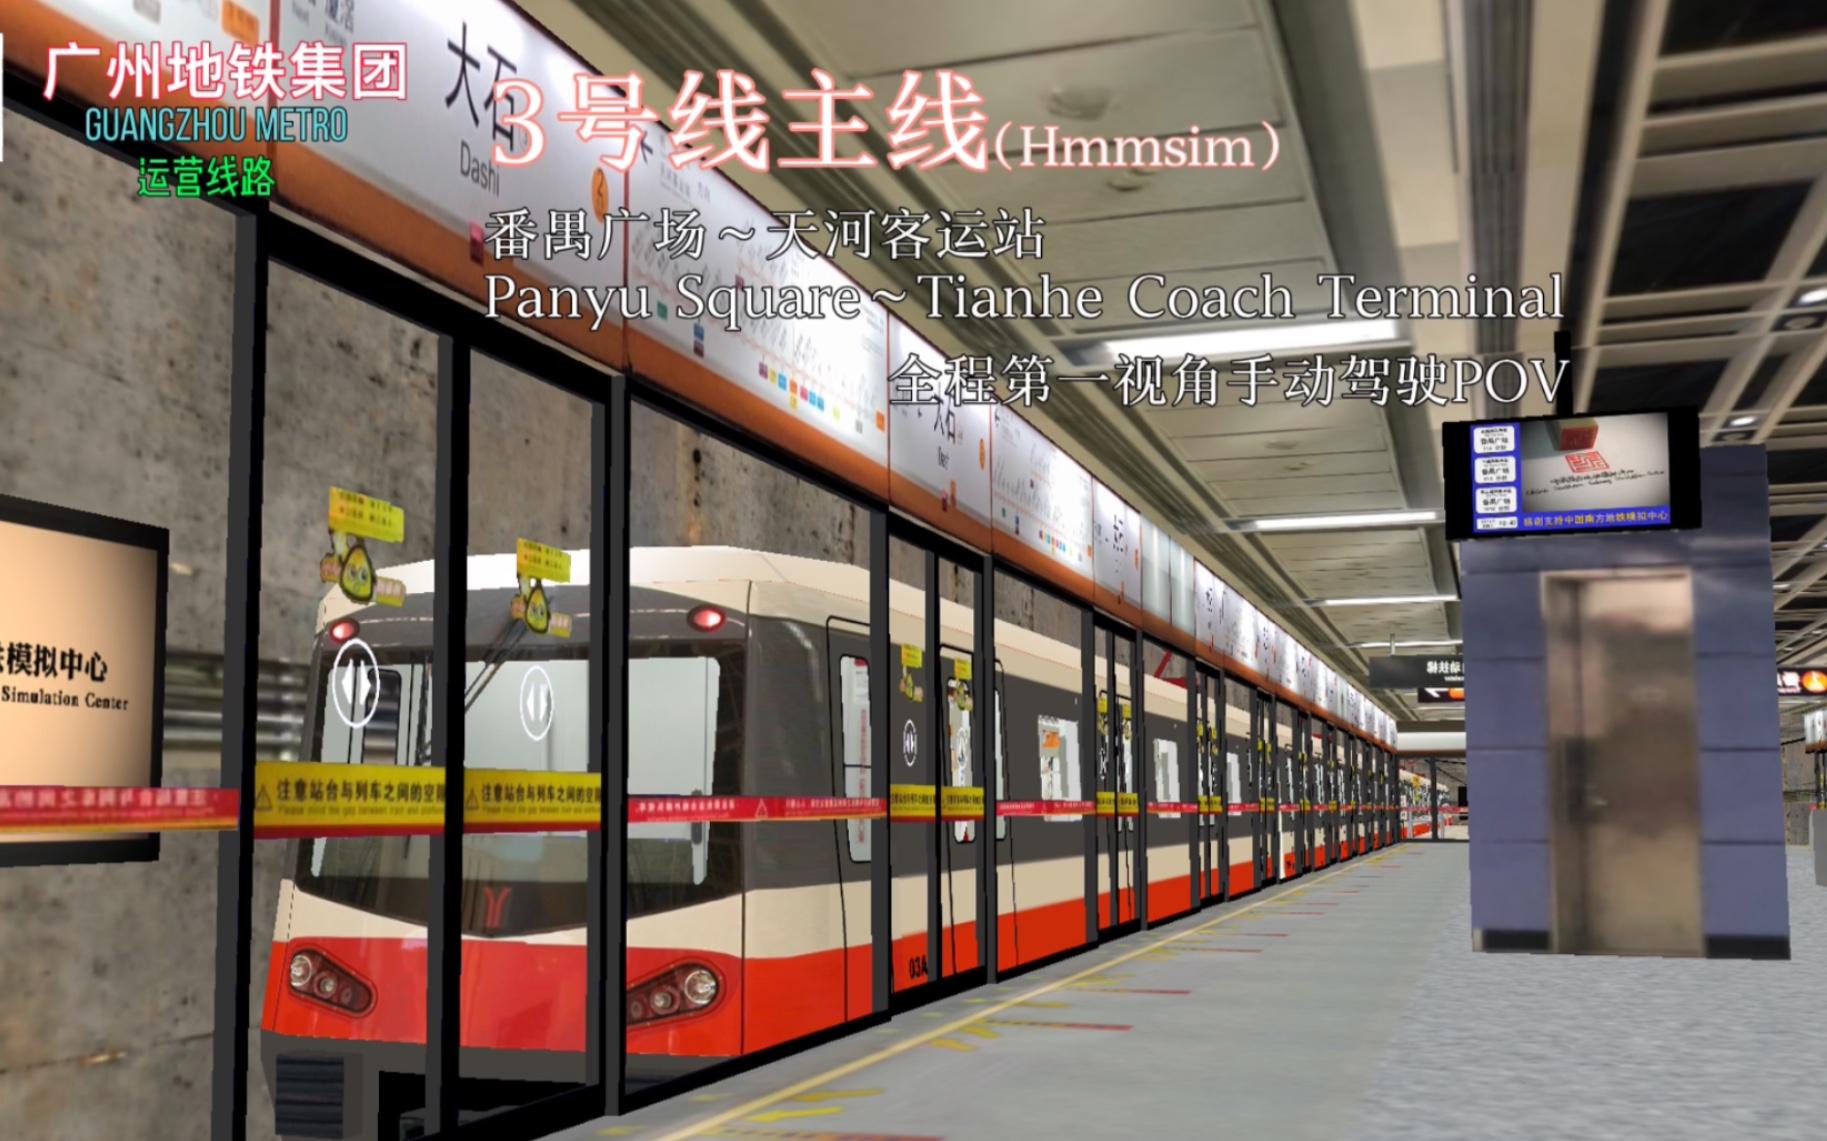 【GZPTF工作室·HM2·POV】#12:广州地铁3号线主线(番禺广场~天河客运站)延时摄影POV-CSSSC制作